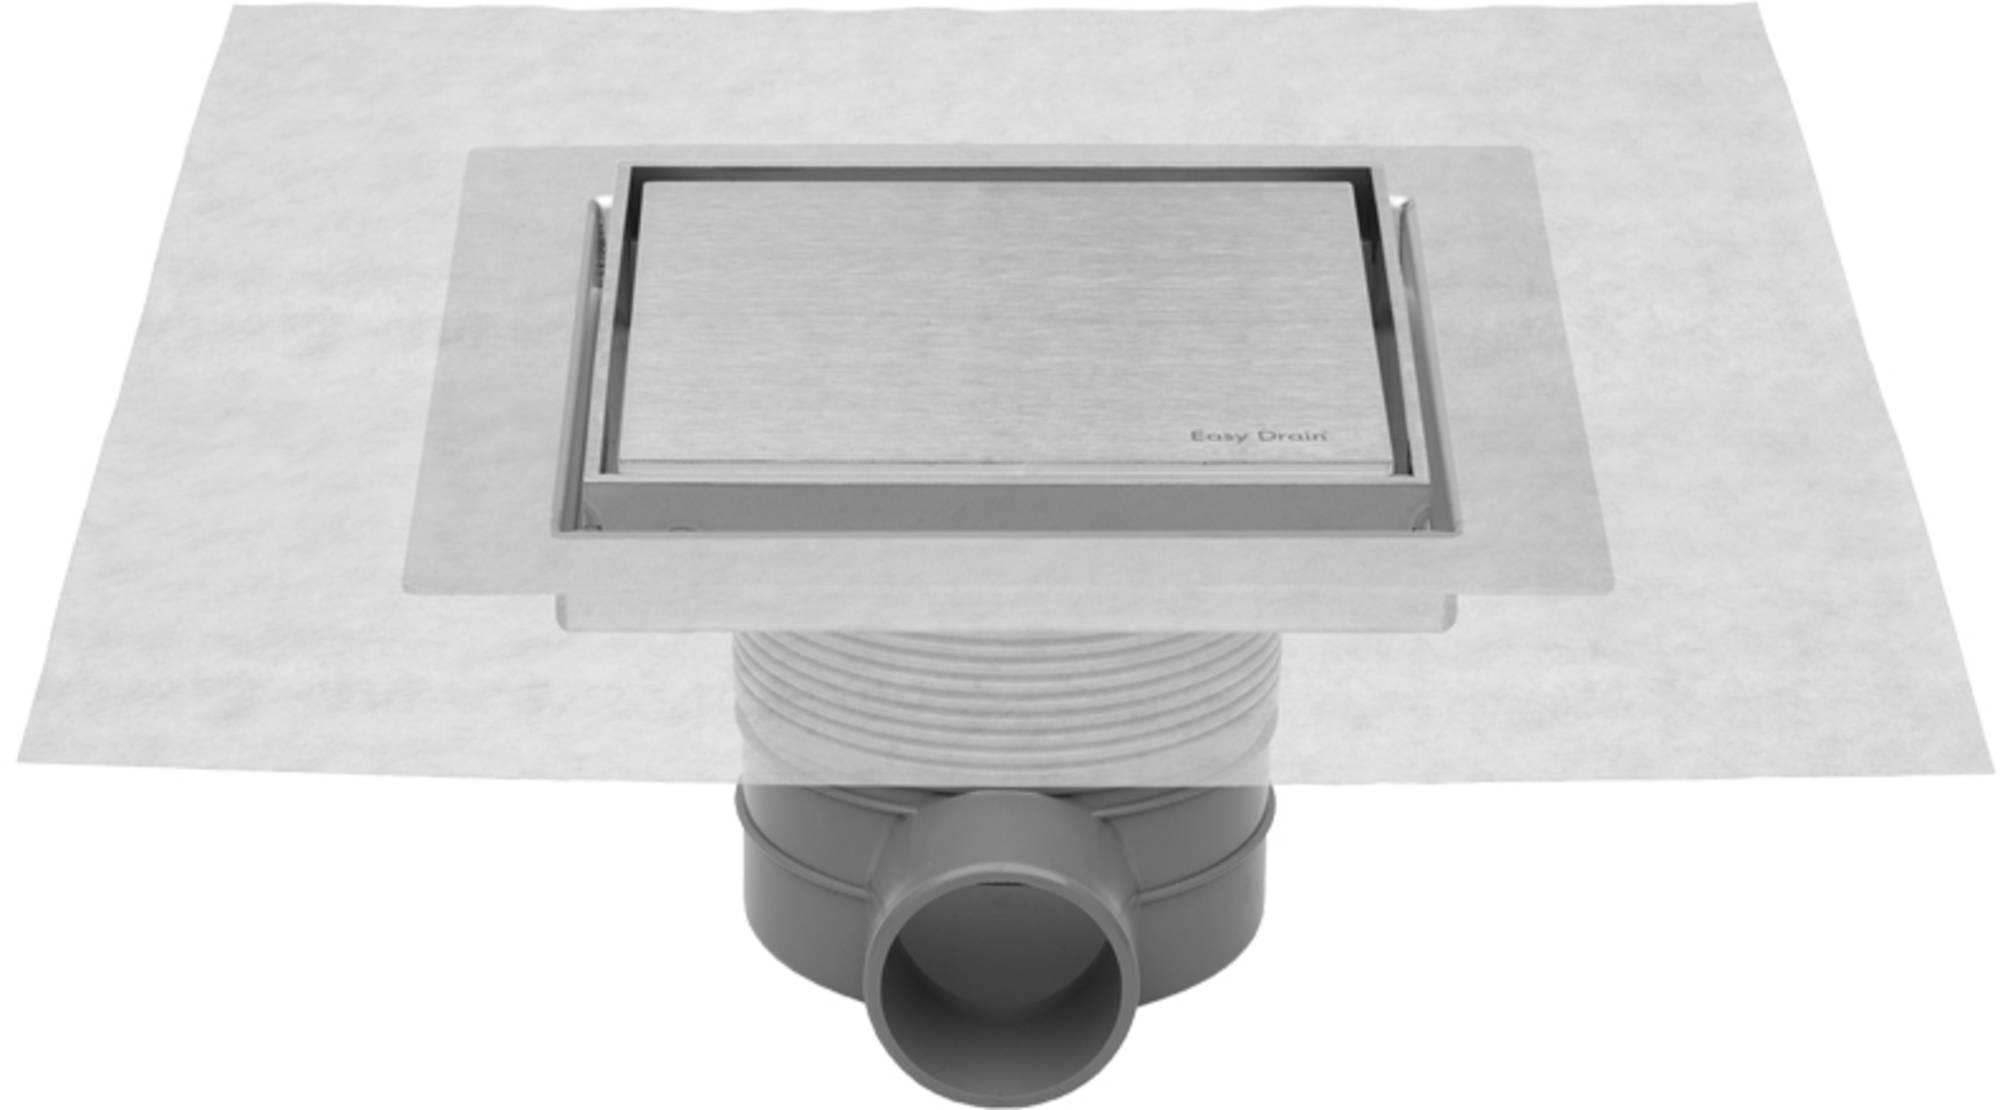 Easydrain Aqua jewels quattro vloerput rvs 10x10 cm, zu multi, rvs geborsteld